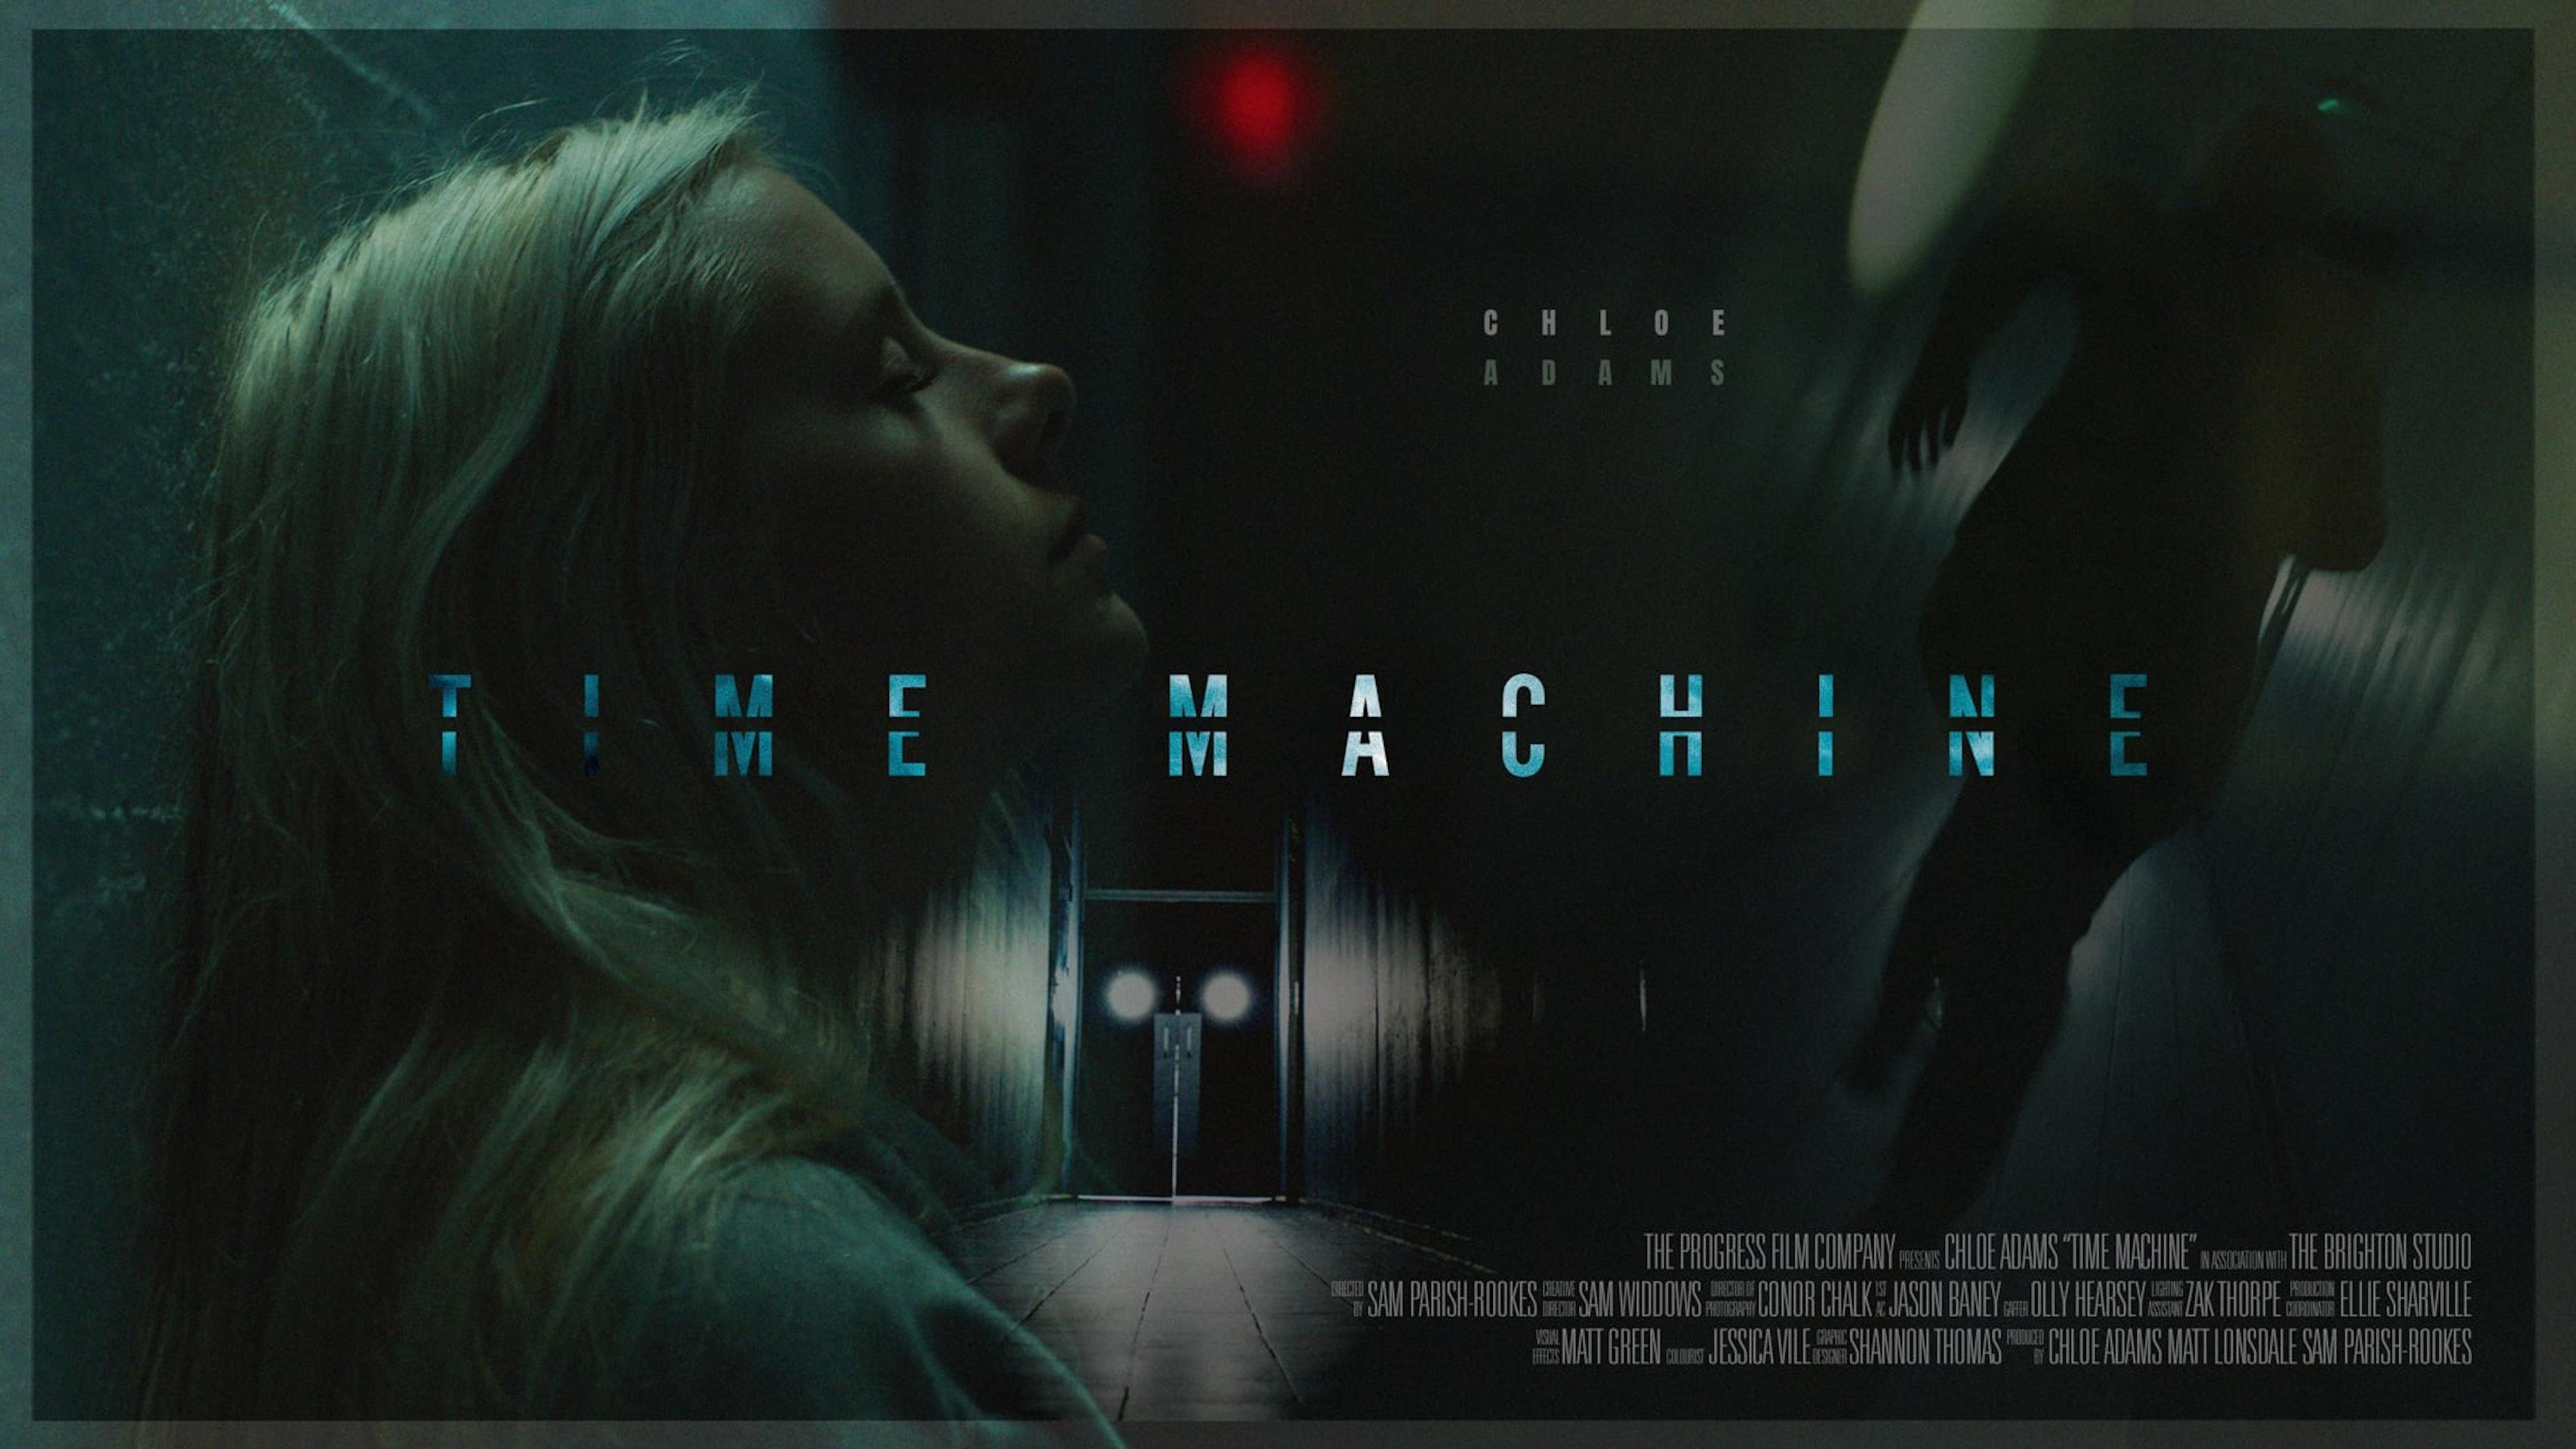 Chloe Adams - Time Machine